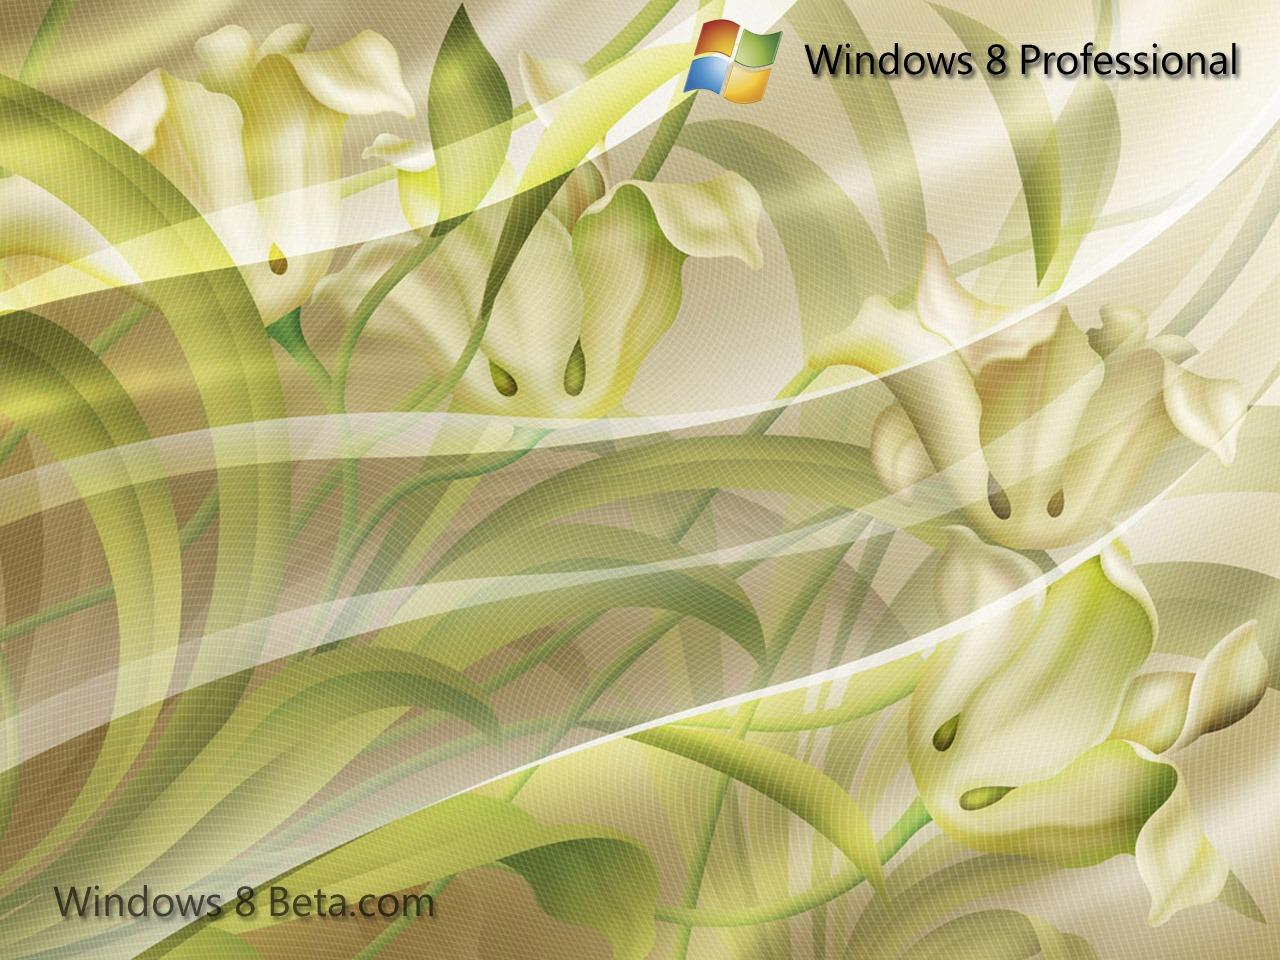 http://3.bp.blogspot.com/-uEcyXecc3xA/TfG09saW8AI/AAAAAAAACEs/TKvTv8tsM2M/s1600/Windows-8-wallpaper_4.jpg